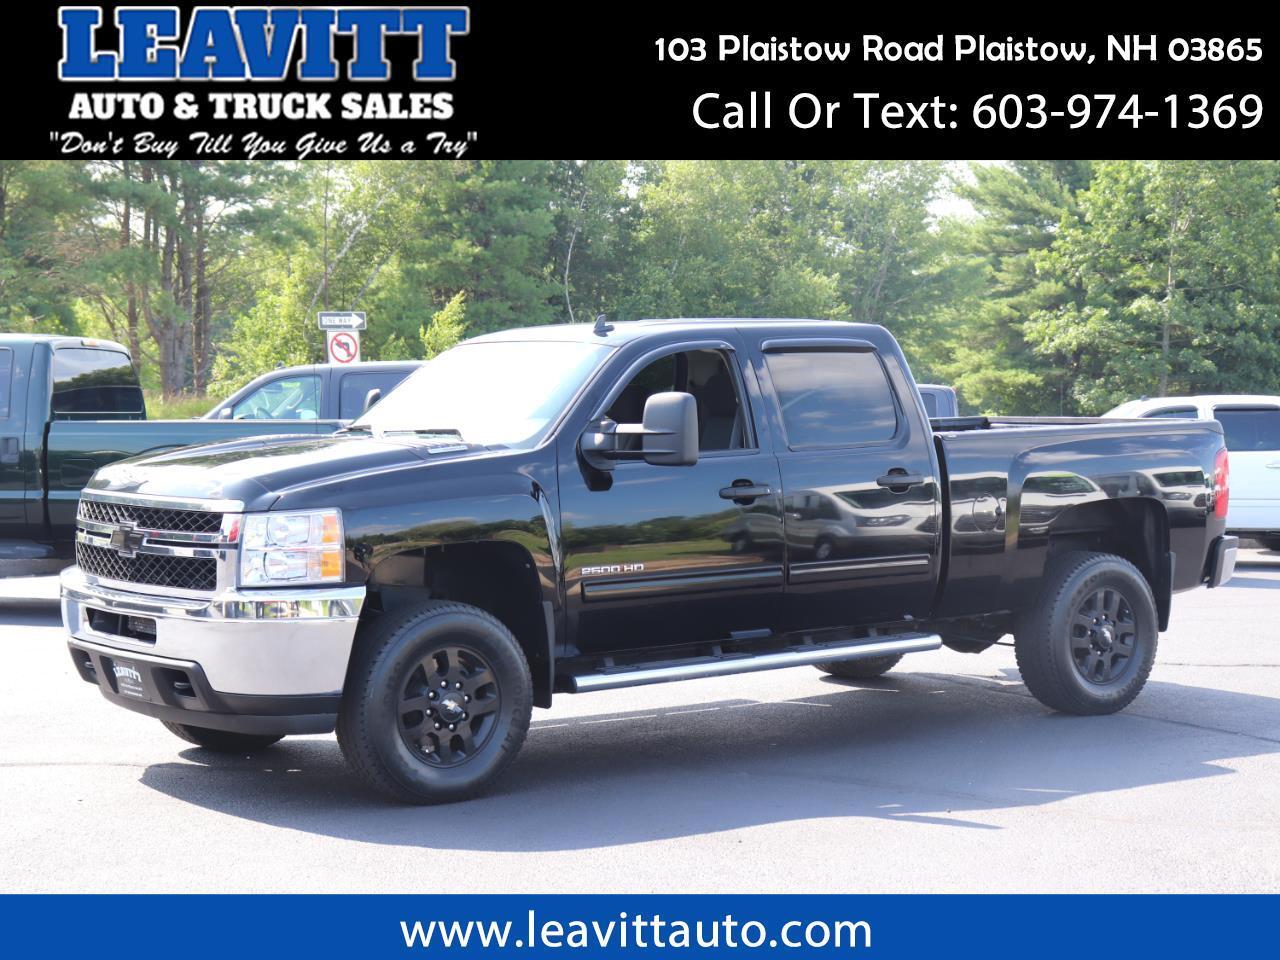 2011 Chevrolet Silverado 2500HD LT CREW CAB 6.6L DURAMAX 71K MILES!!